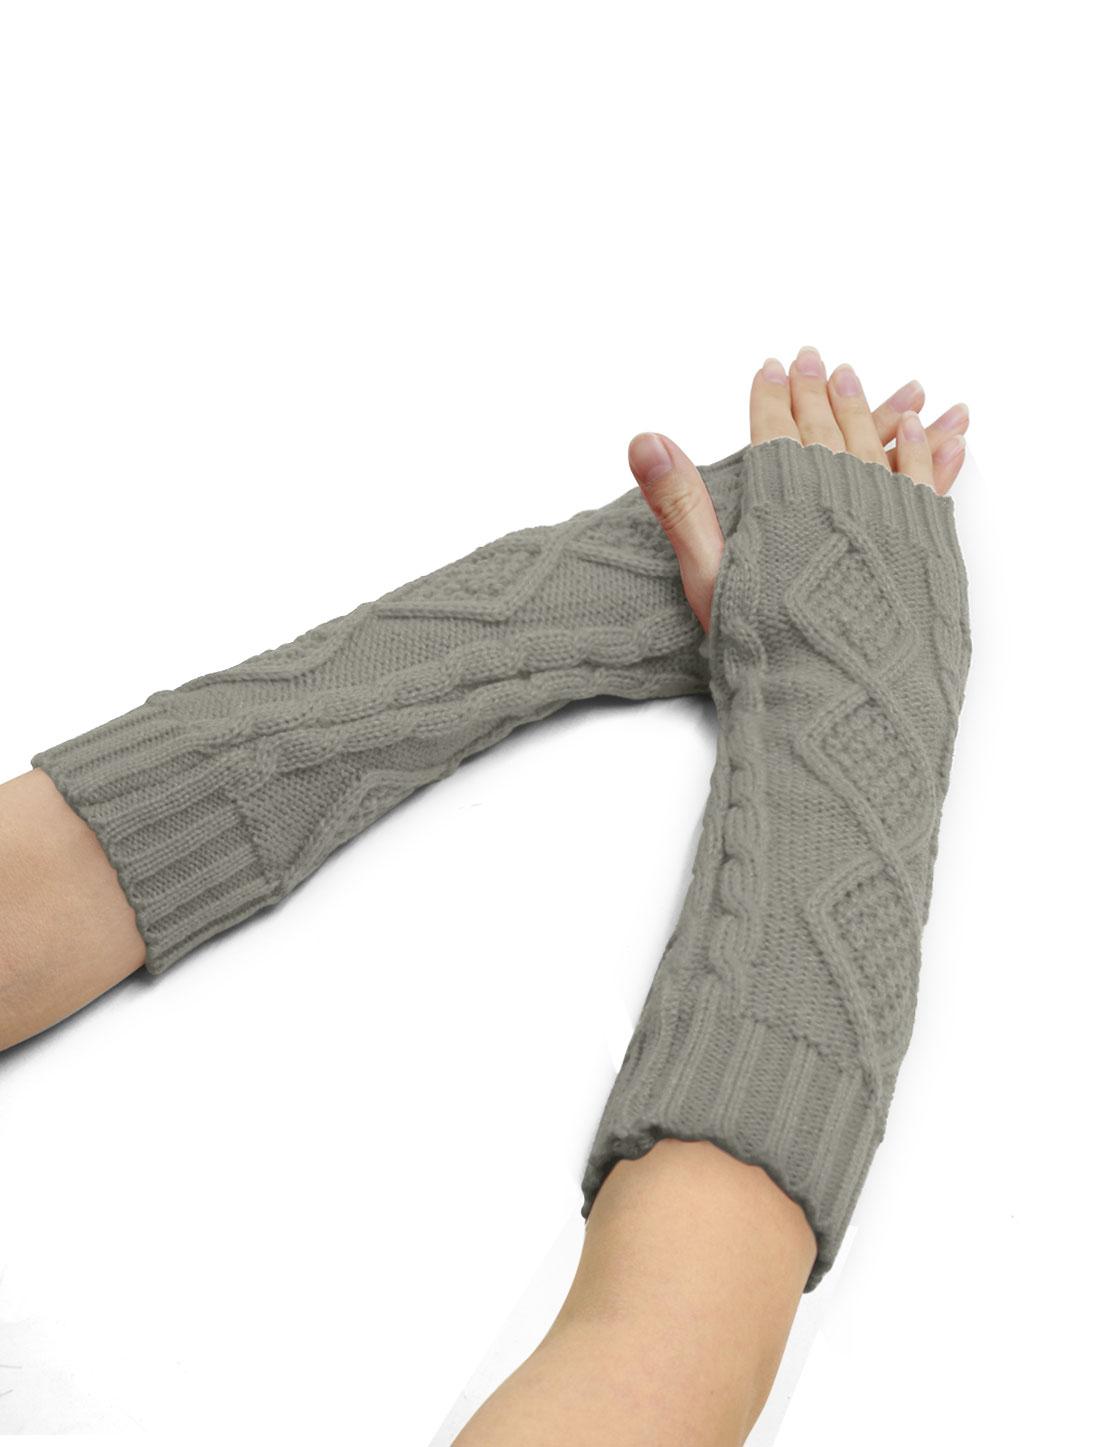 Women Elbow Length Argyle Design Cable Knit Arm Warmers Pair Light Gray